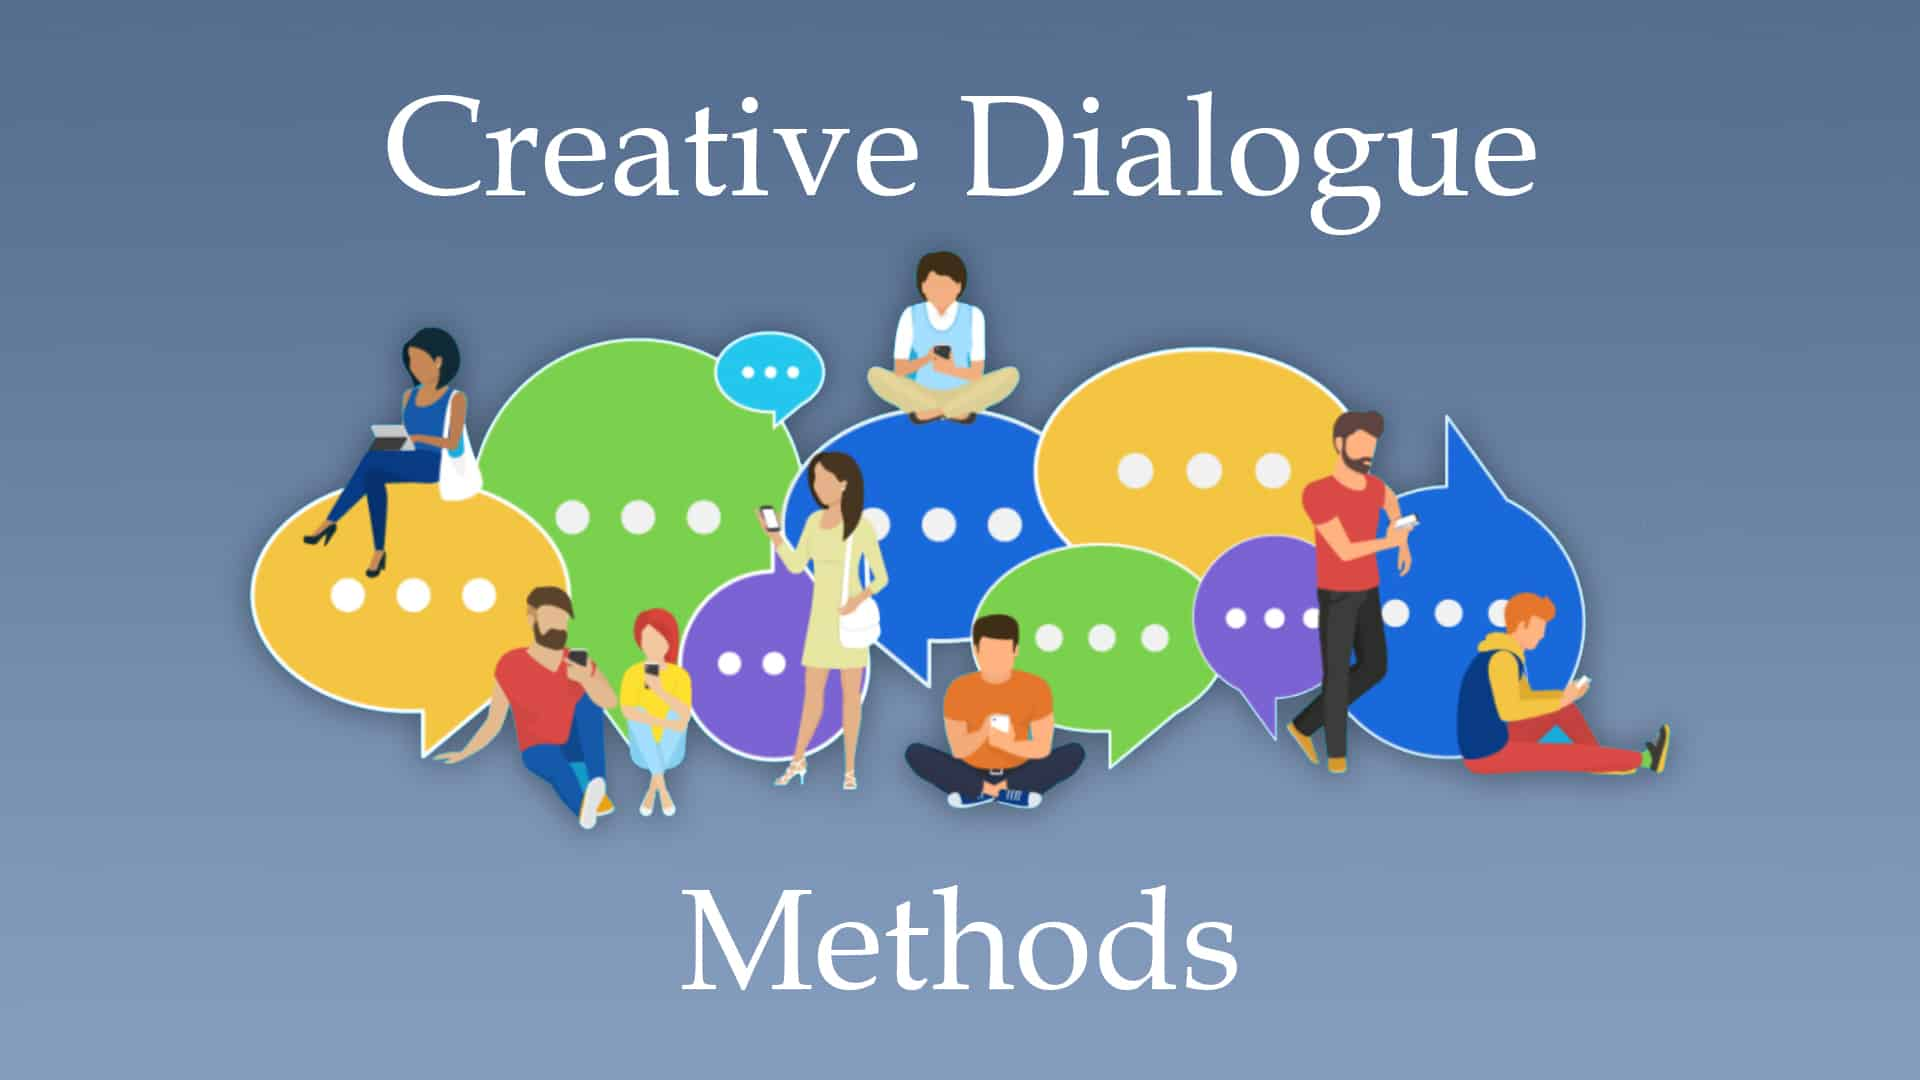 Creative dialogue methods title